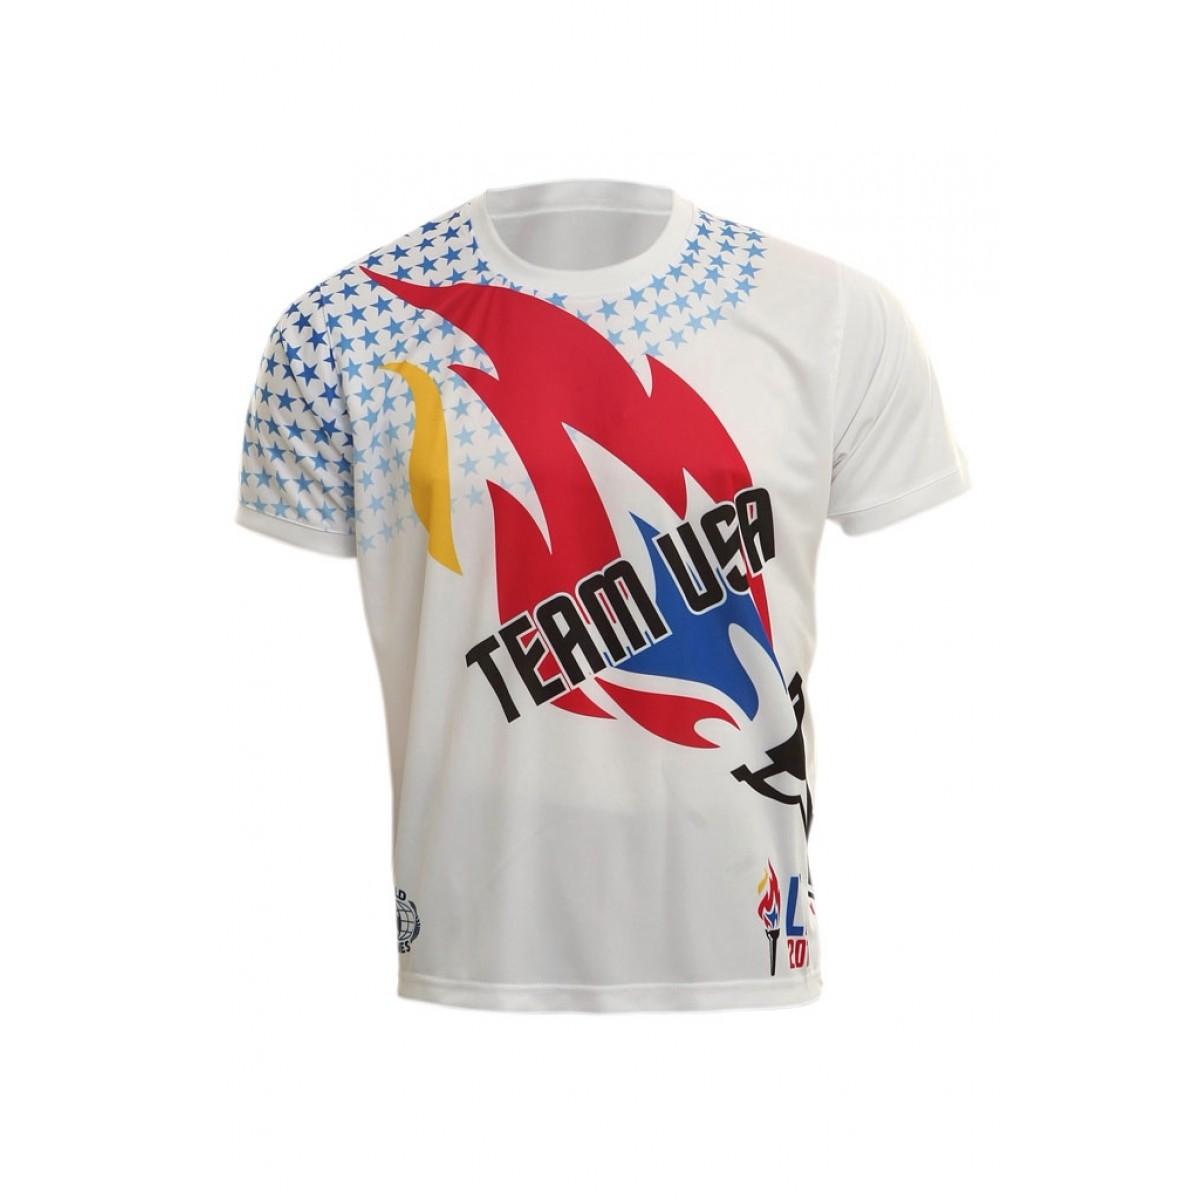 TEAM USA Sublimated T-shirt